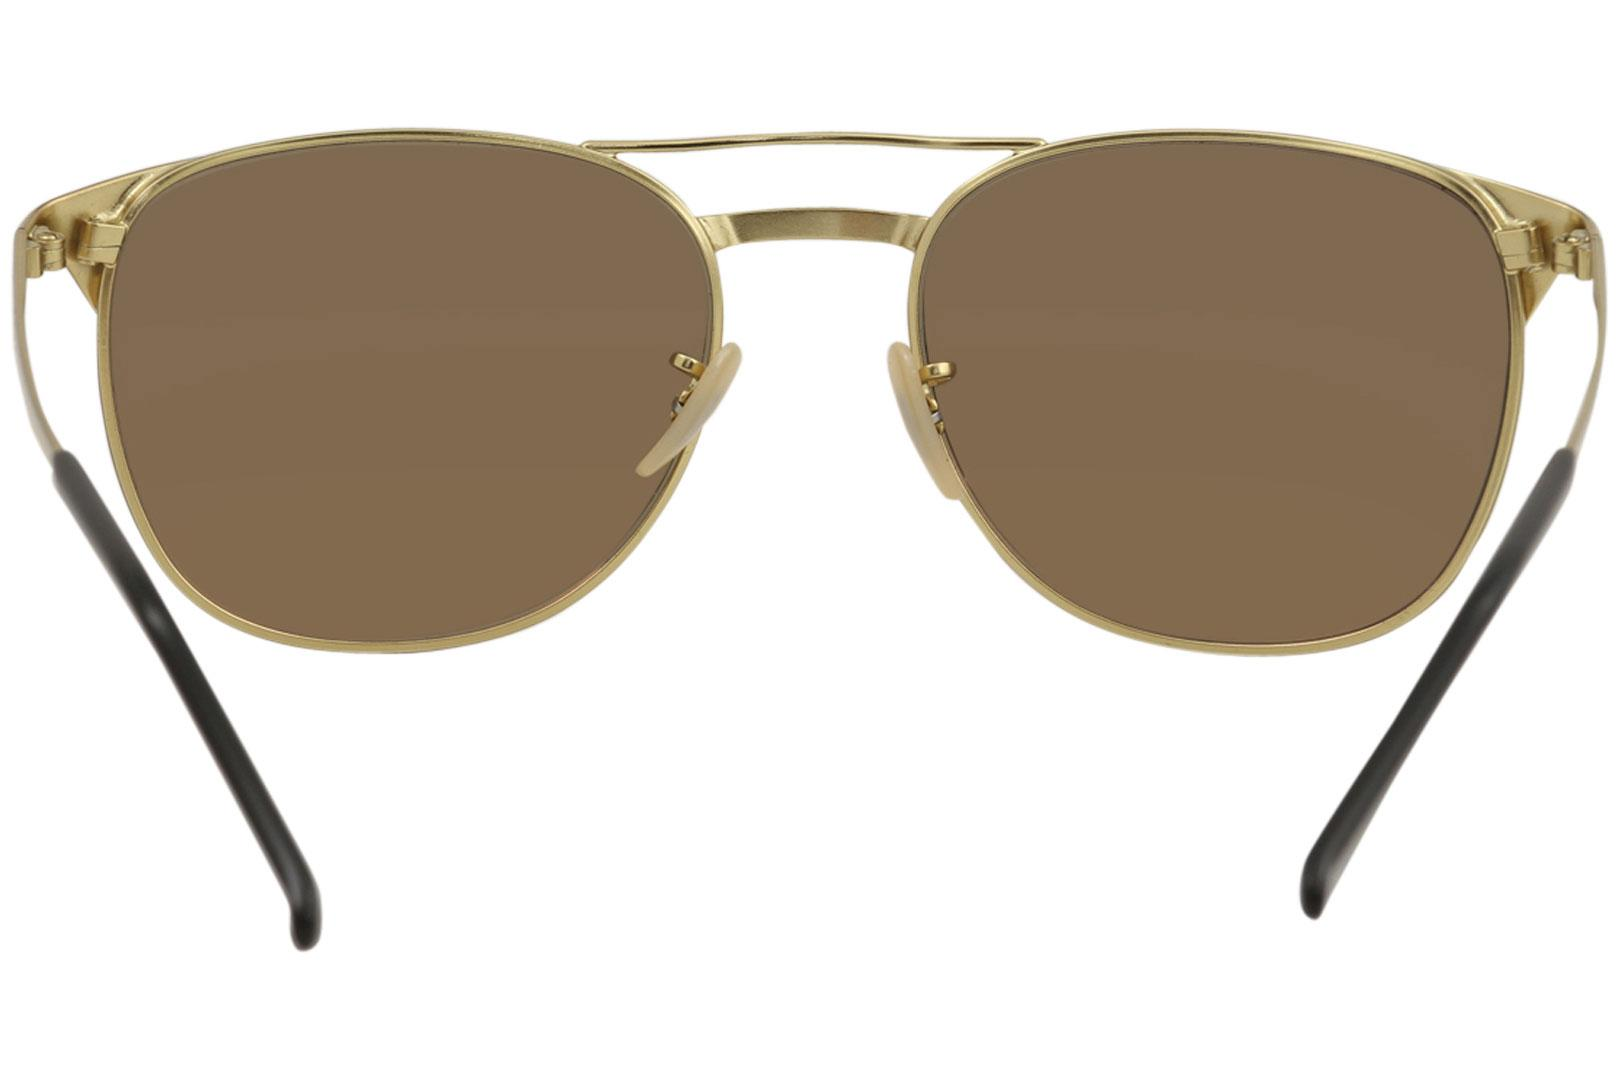 23cbe28d895 Ray Ban Men s Signet RB3429M RB 3429 M RayBan Fashion Pilot Sunglasses